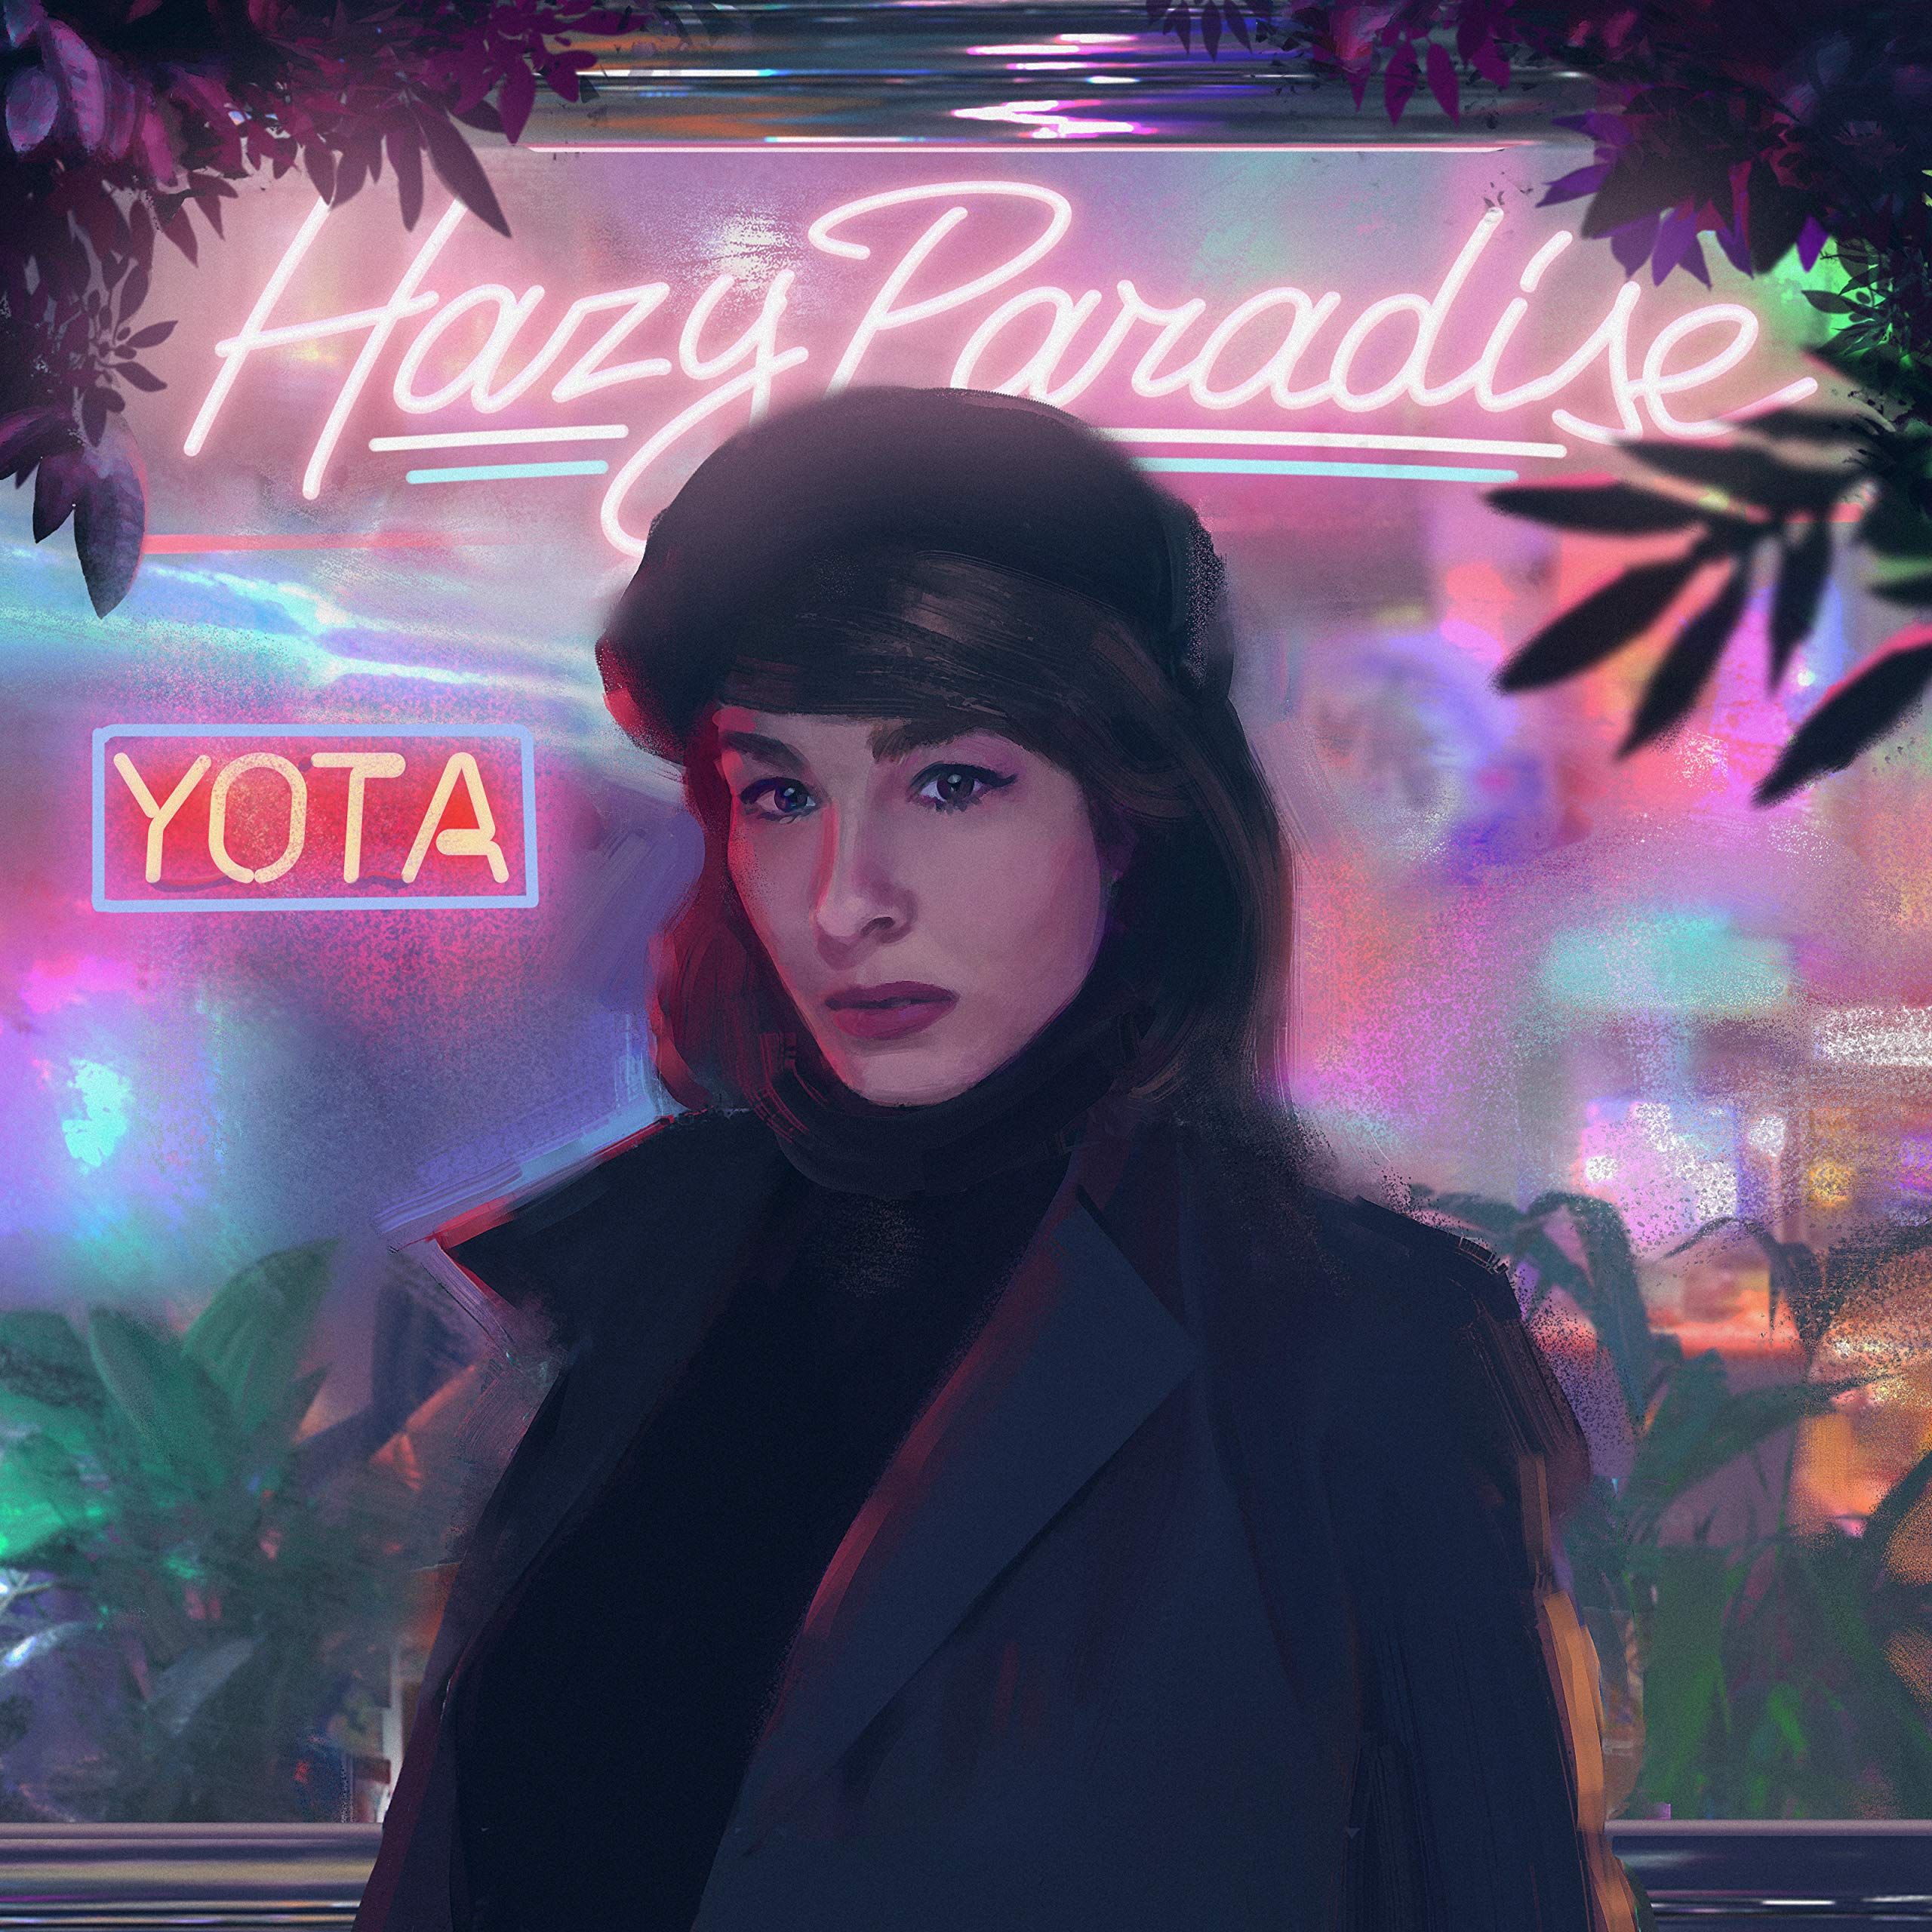 Yota - Hazy Paradise (2020) [FLAC] Download